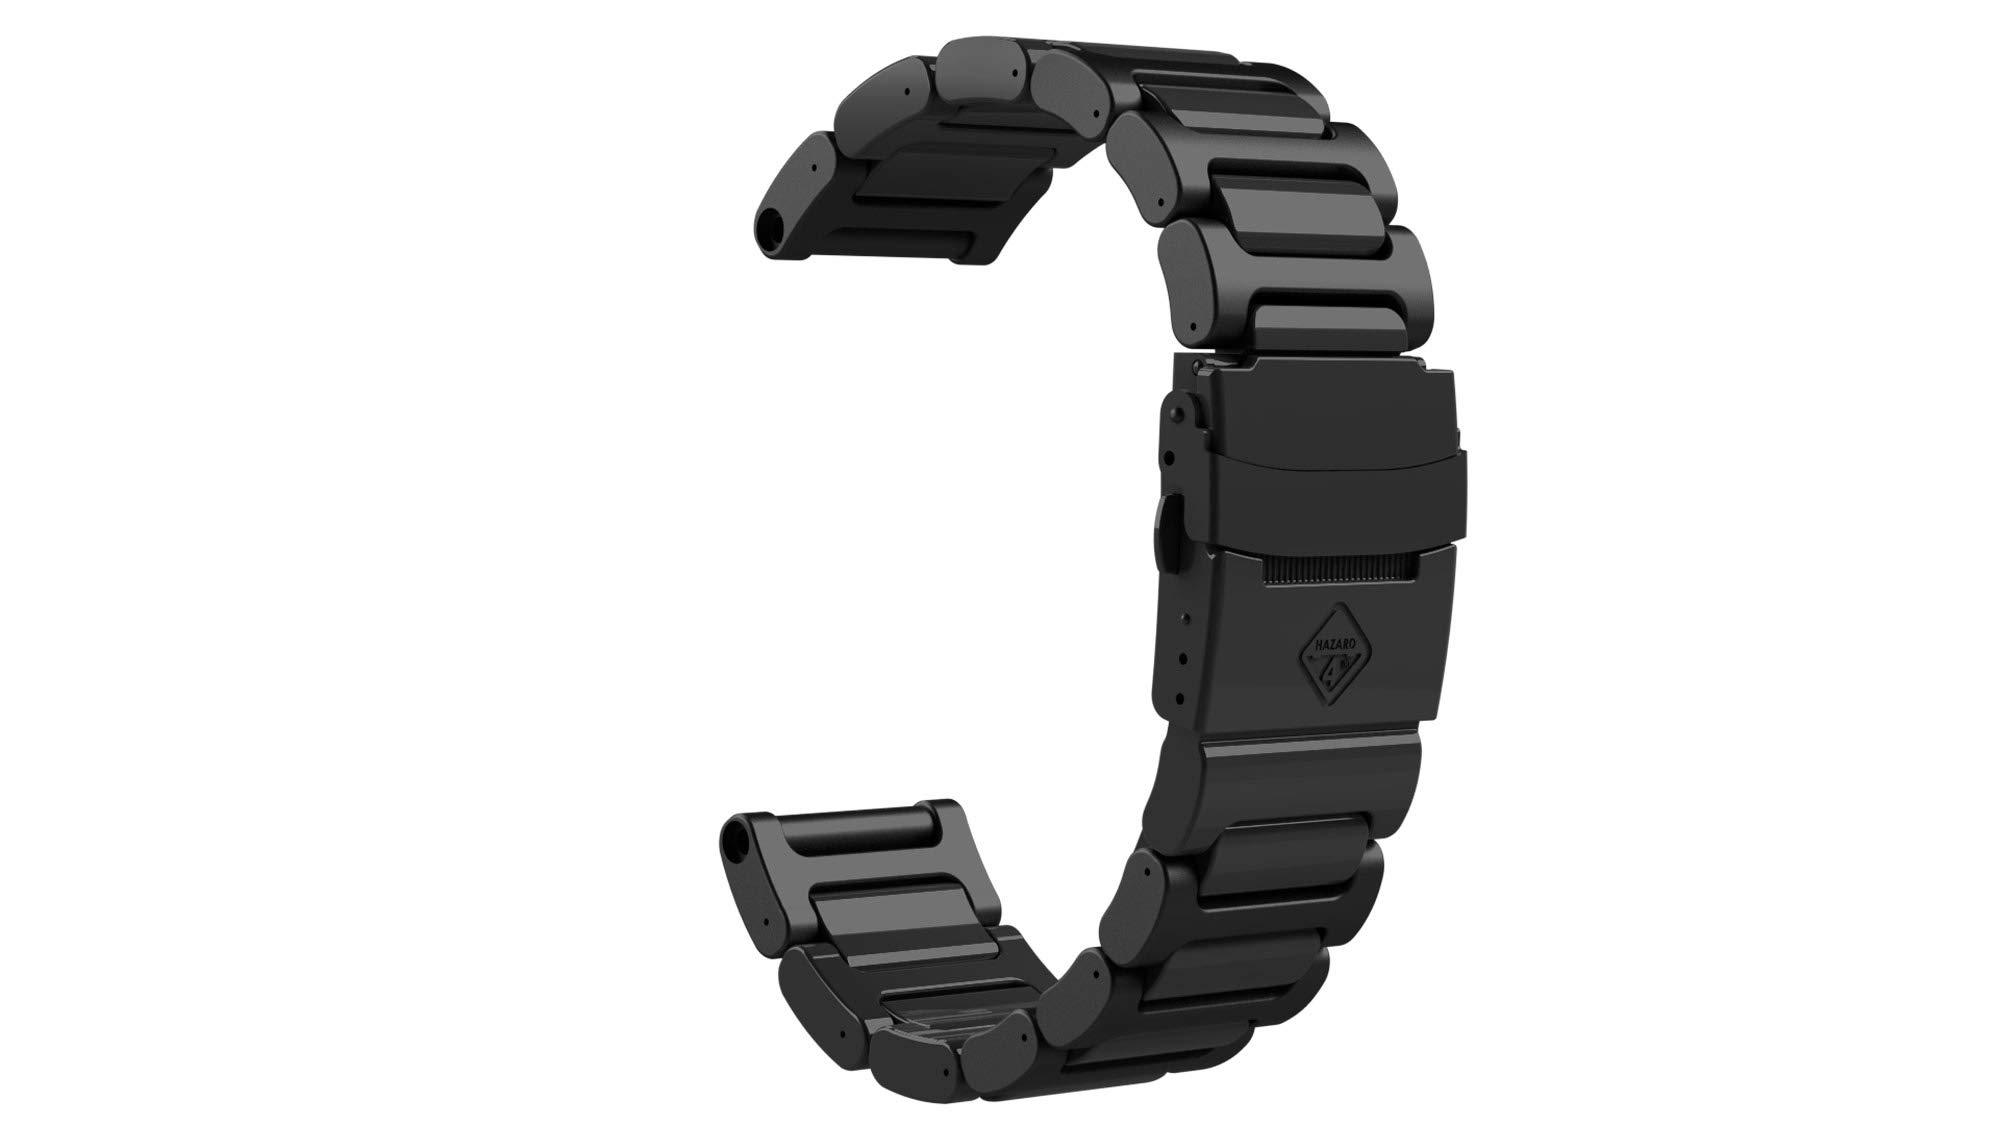 HAZARD 4 Titanium Bracelet for Heavy Water Diver(TM) - Black